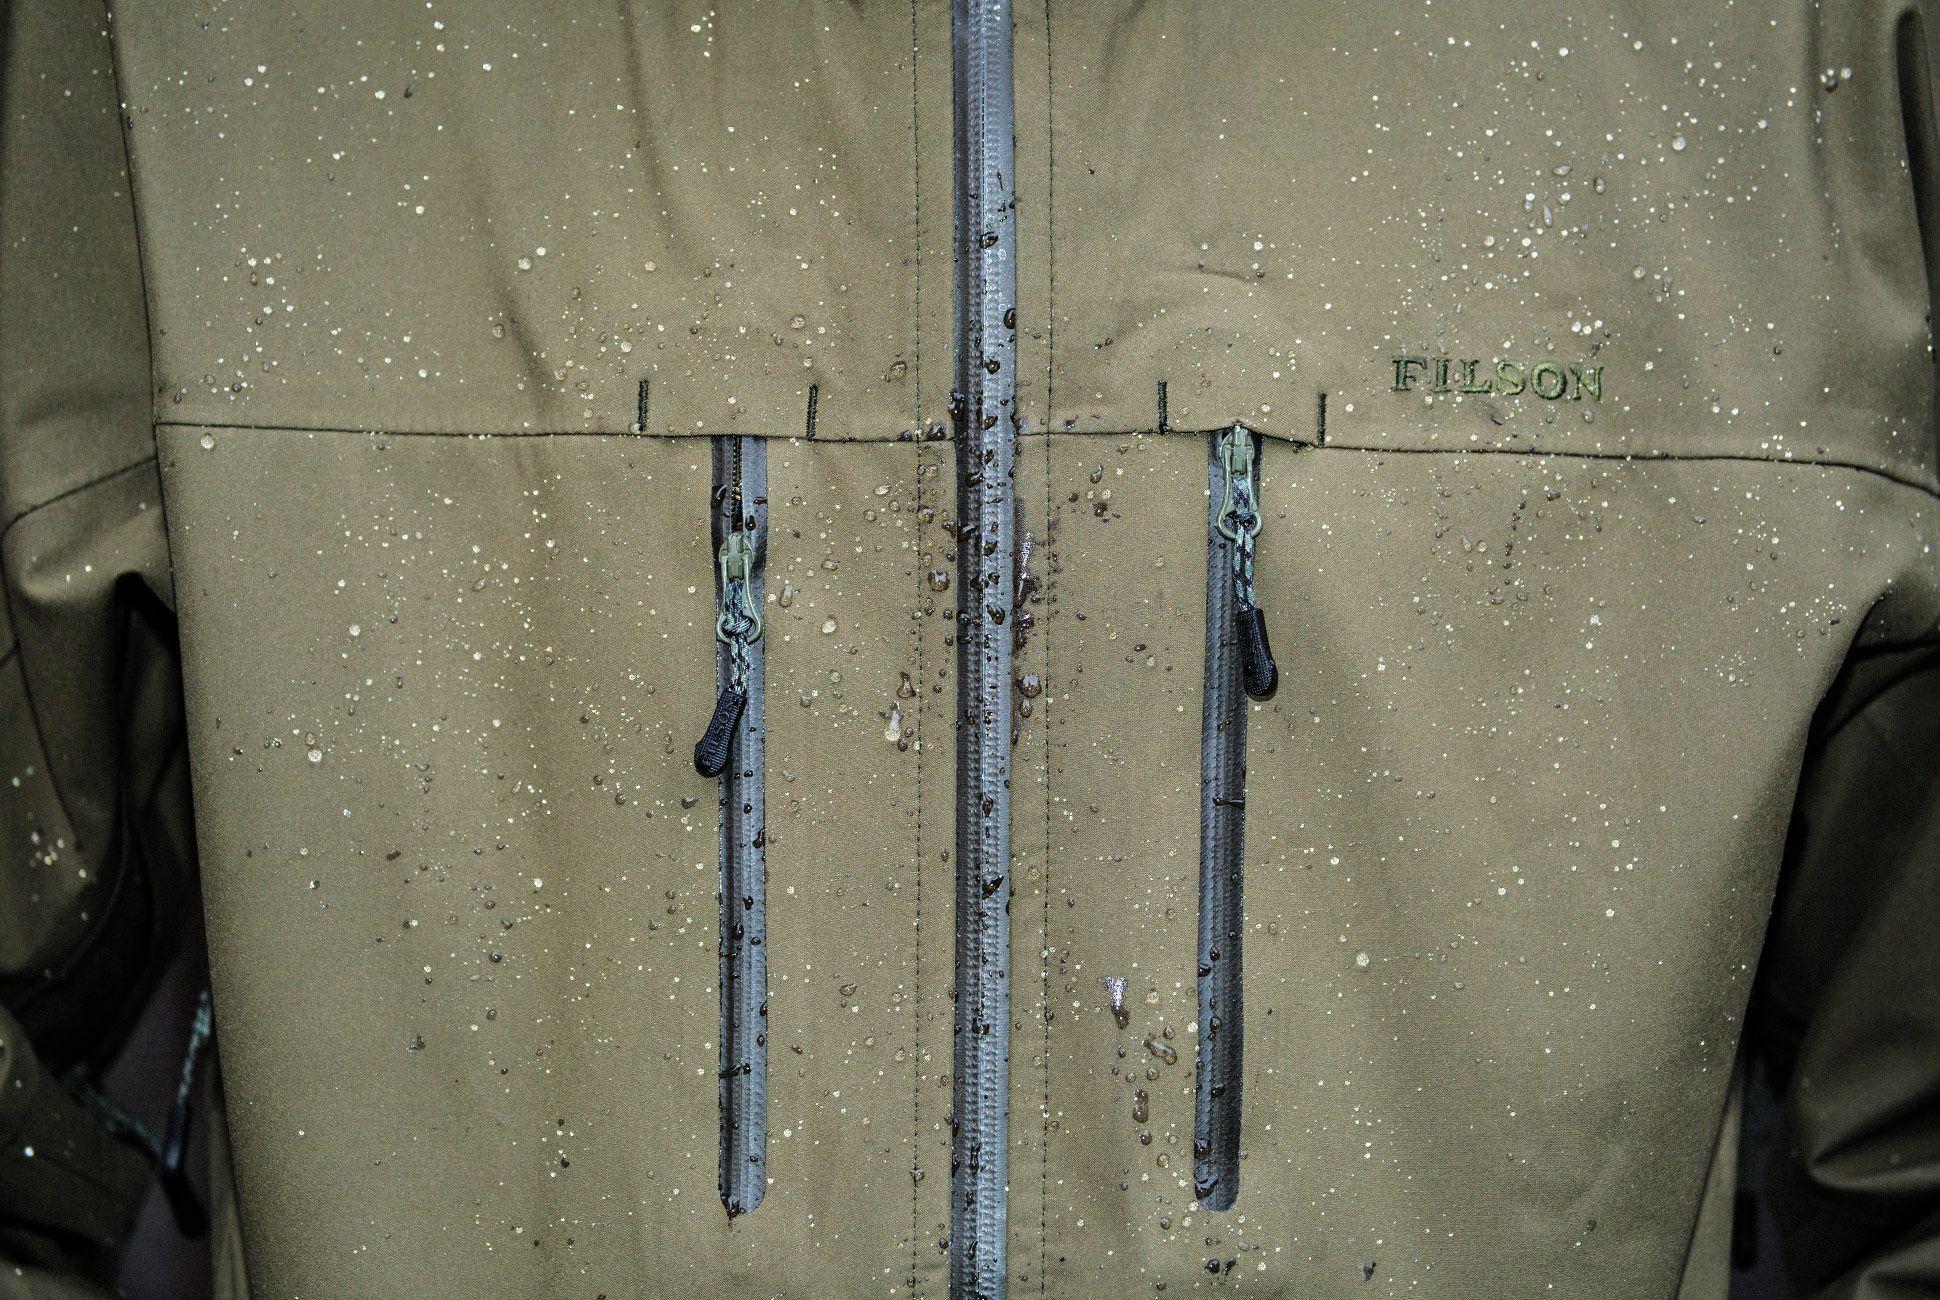 Filson-Neoshell-Reliance-Rainjacket-gear-patrol-slide-2